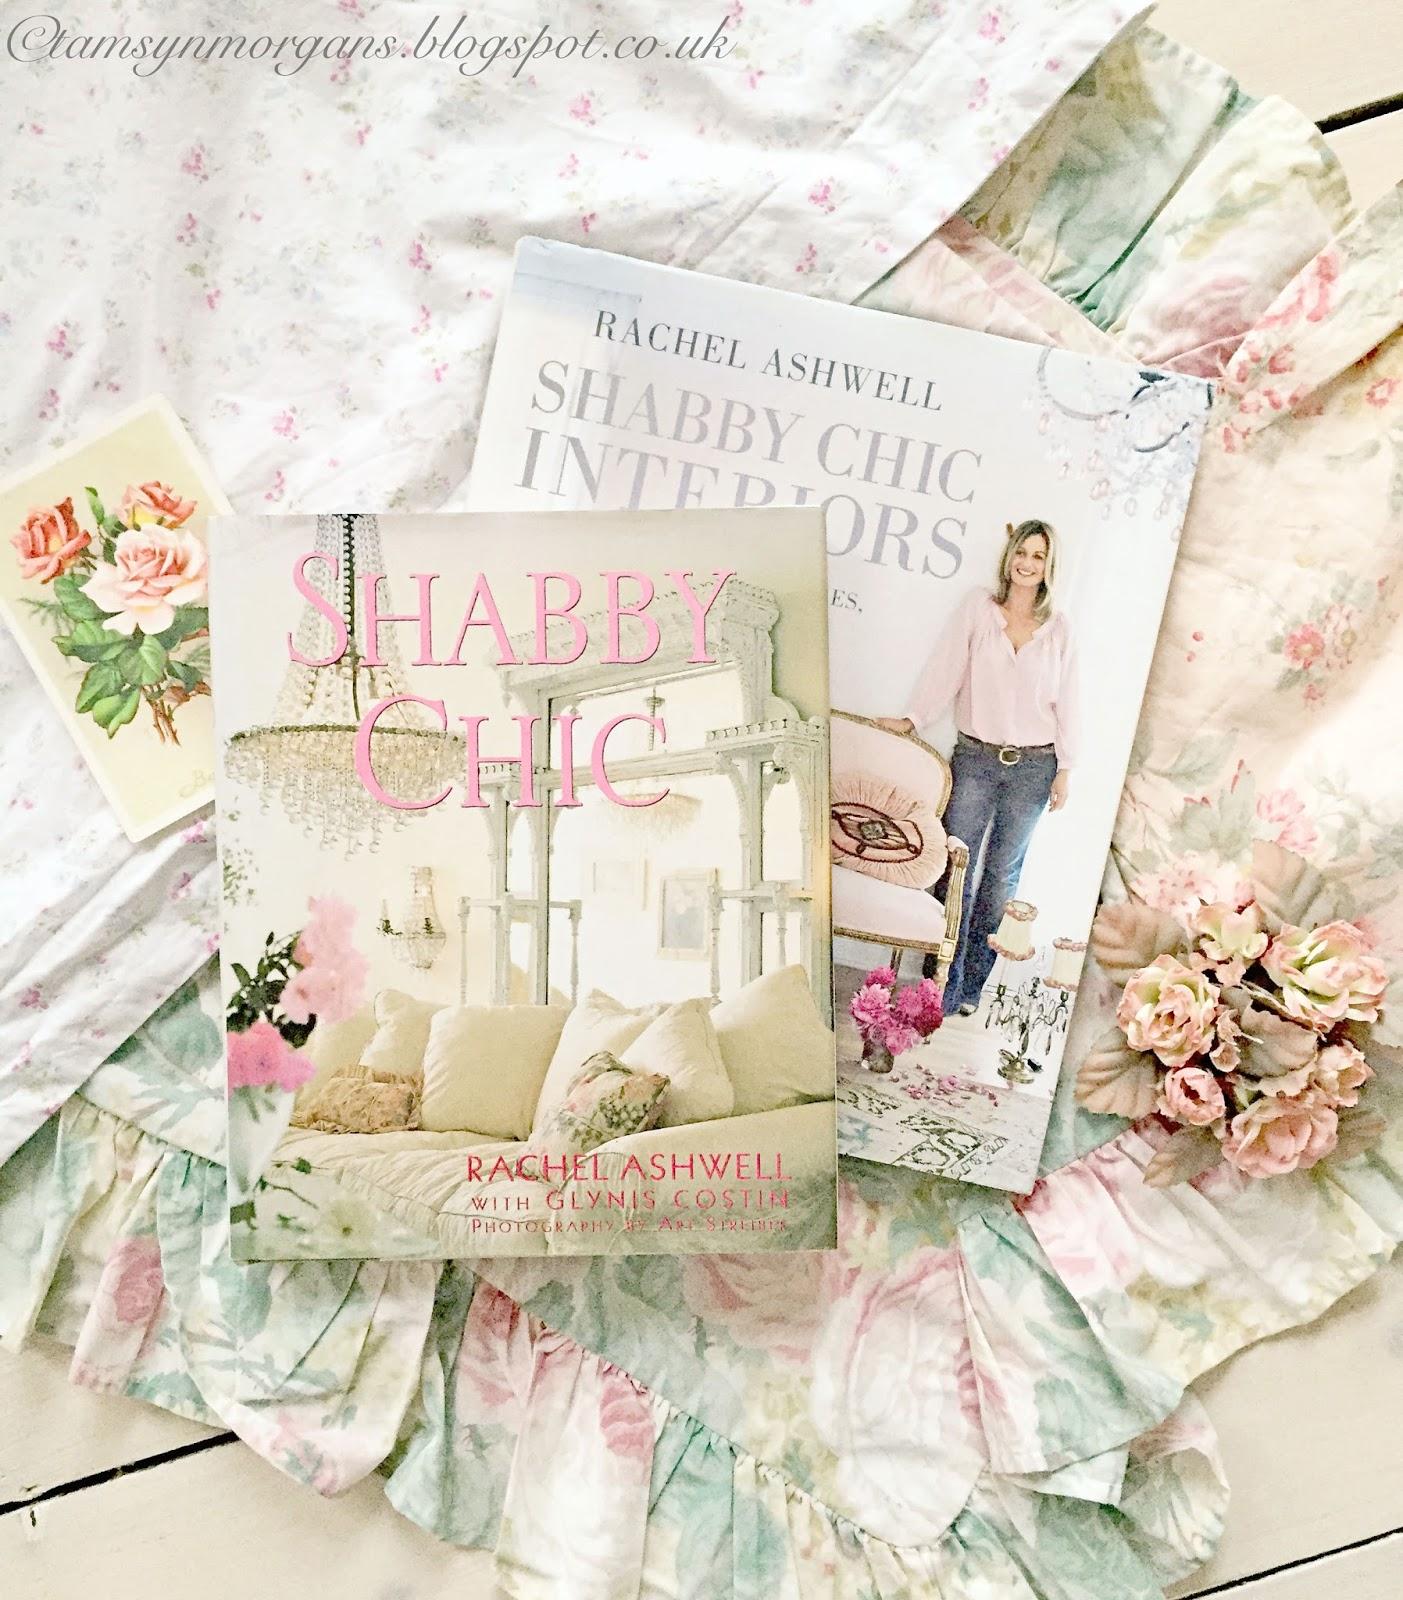 Rachel Ashwell Book Signing